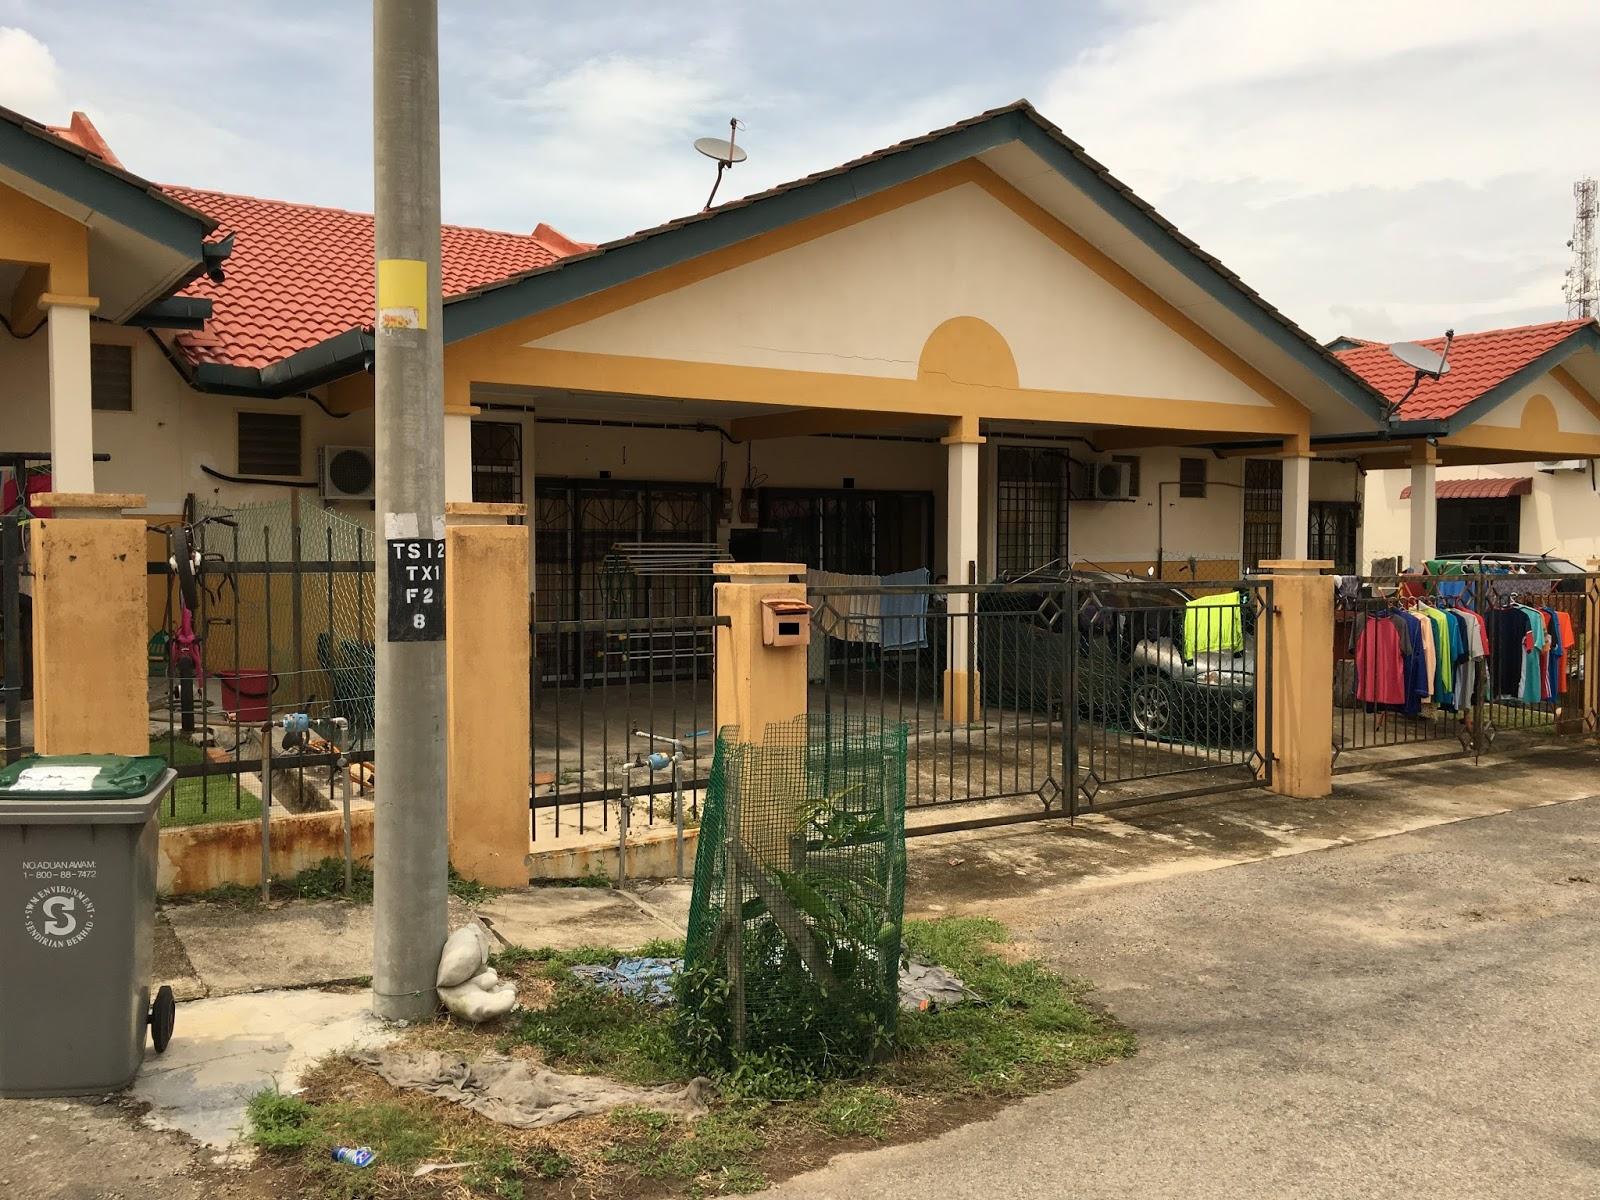 rumah untuk di jual beli dari broker hartanah berdaftar